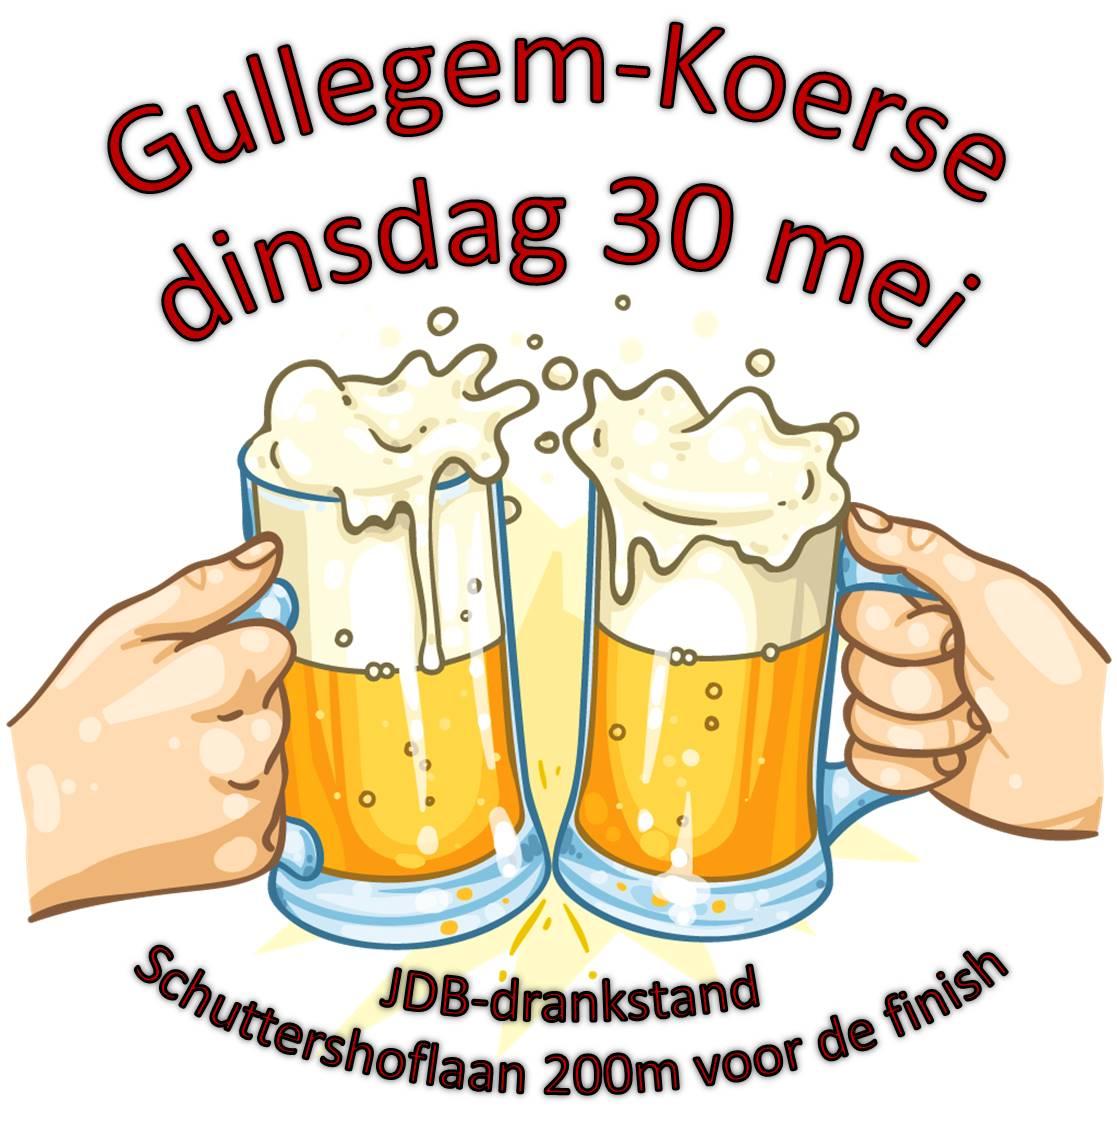 Gullegem-Koerse - reclame